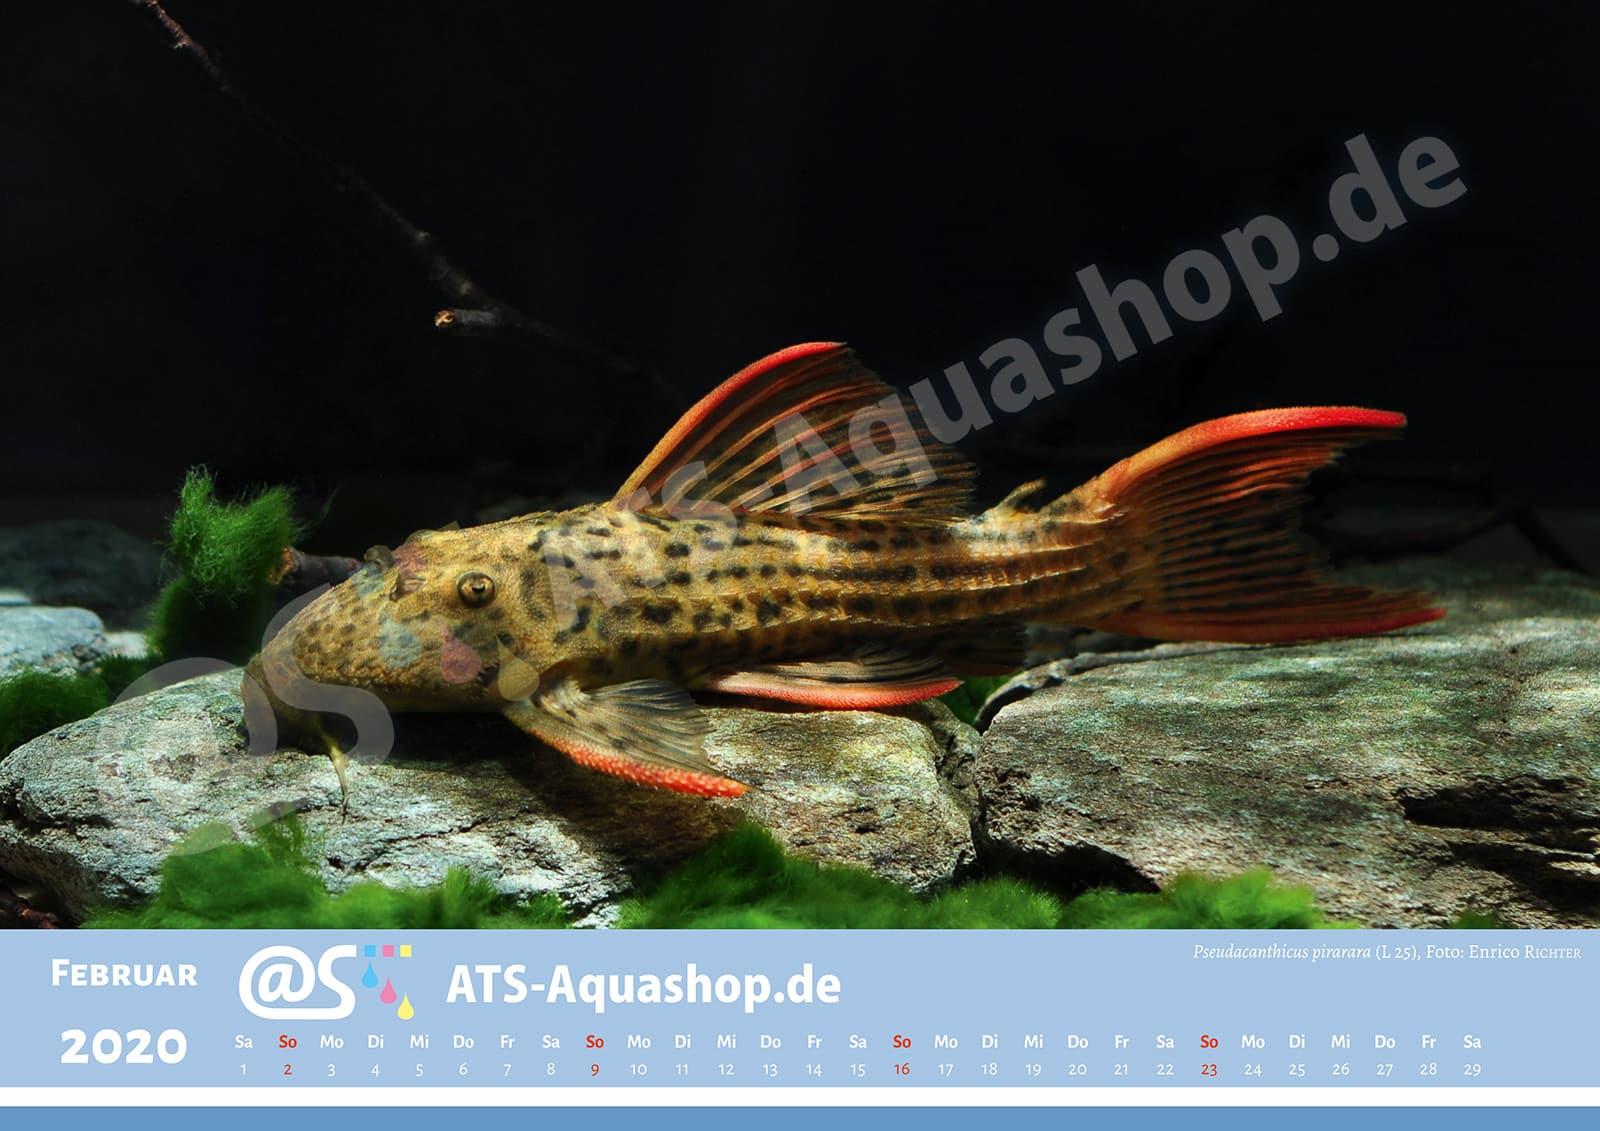 Photo calendar 2019 DIN A3: Pseudacanthicus pirarara (L 25)